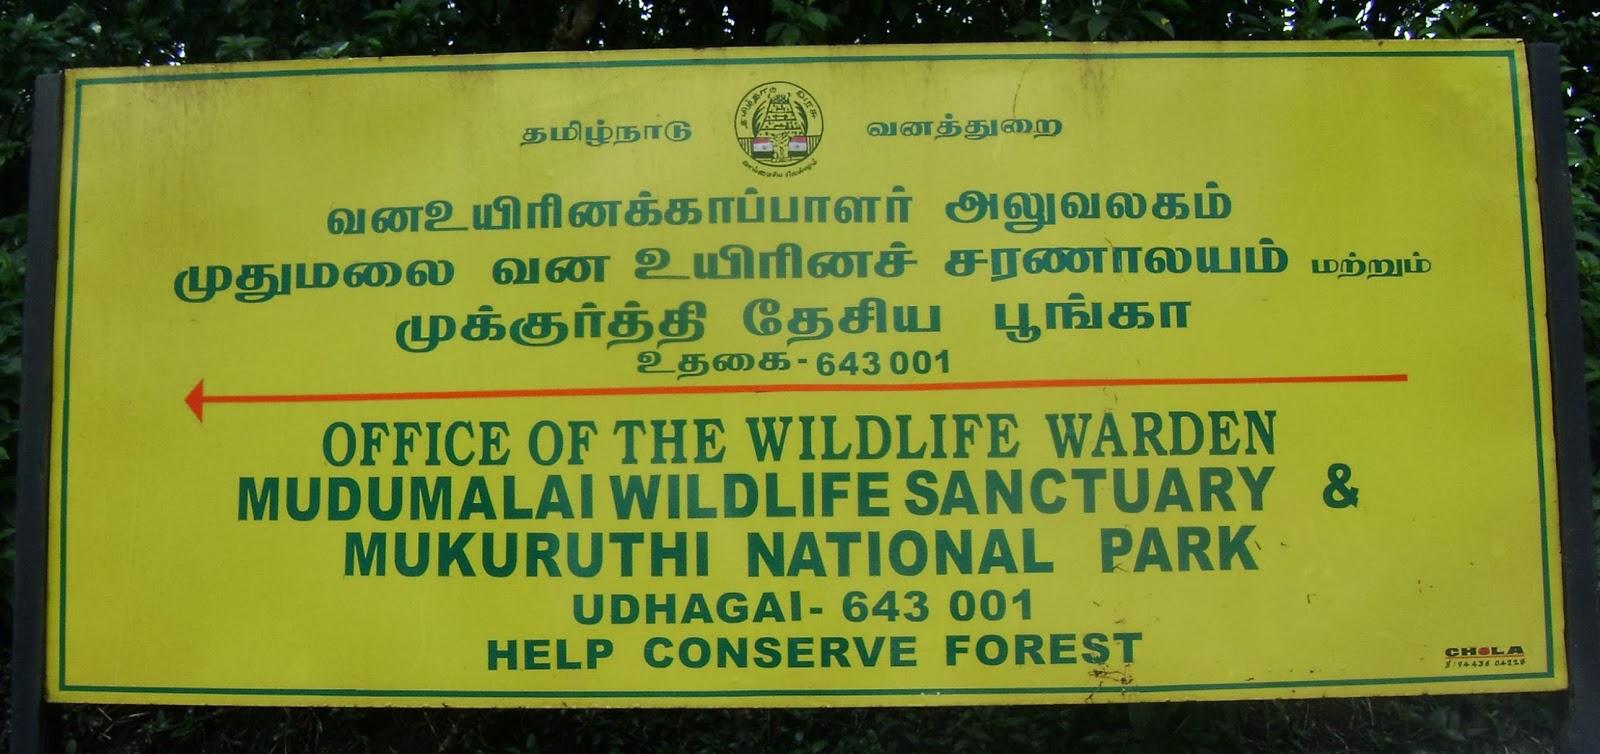 List of Major Dams /Reservoirs in Tamilnadu State